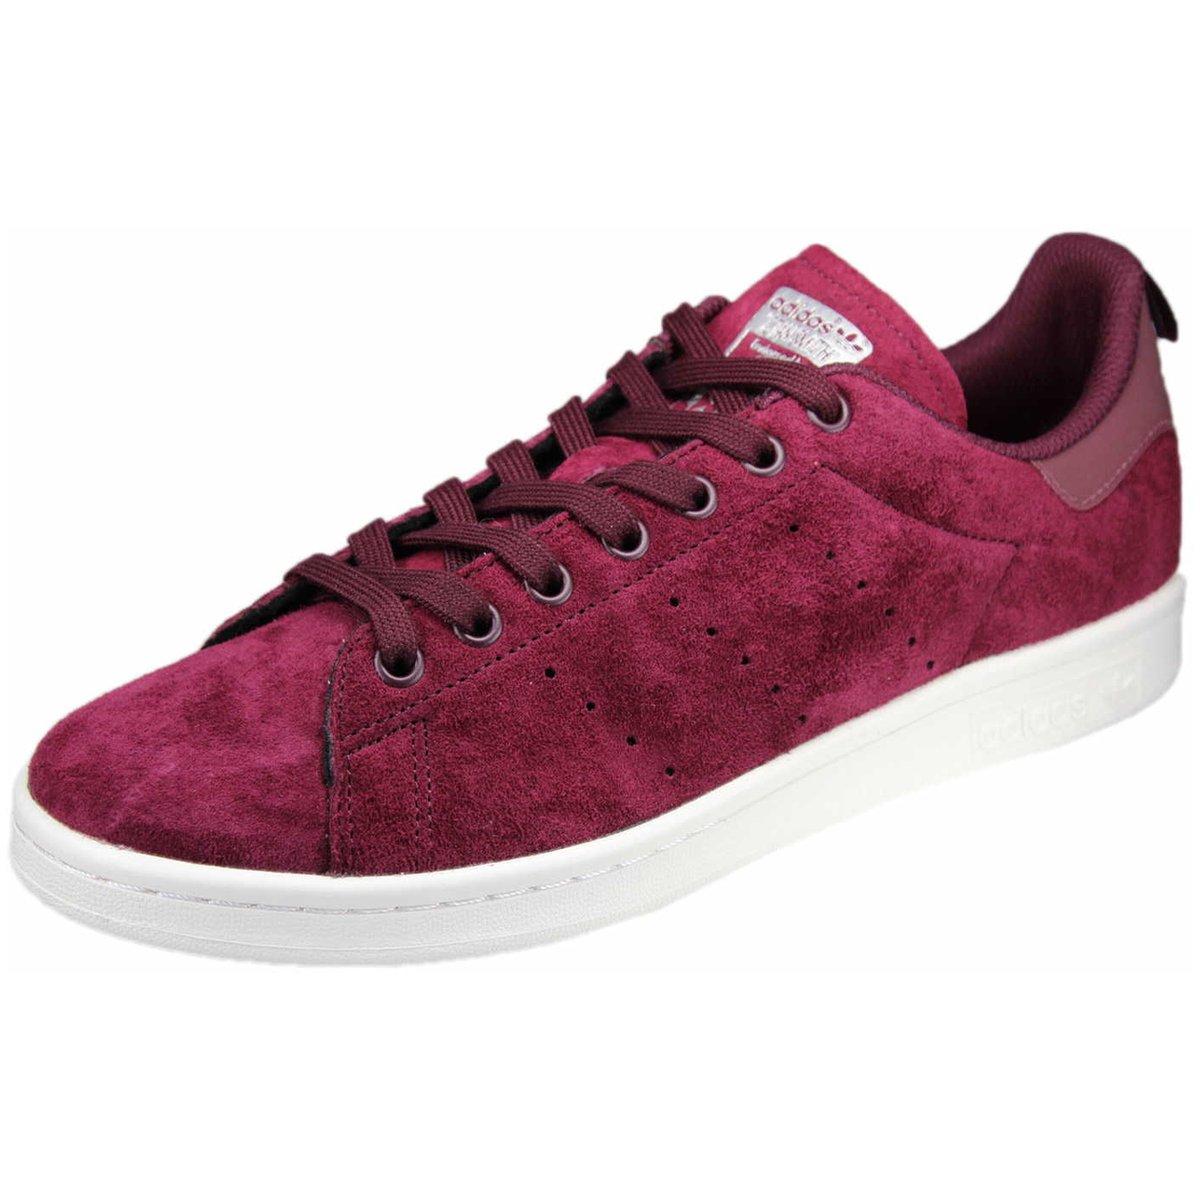 NEU adidas Damen Sneaker Stan Smith Sneaker Herren Schuhe rot S80028 rot 320960